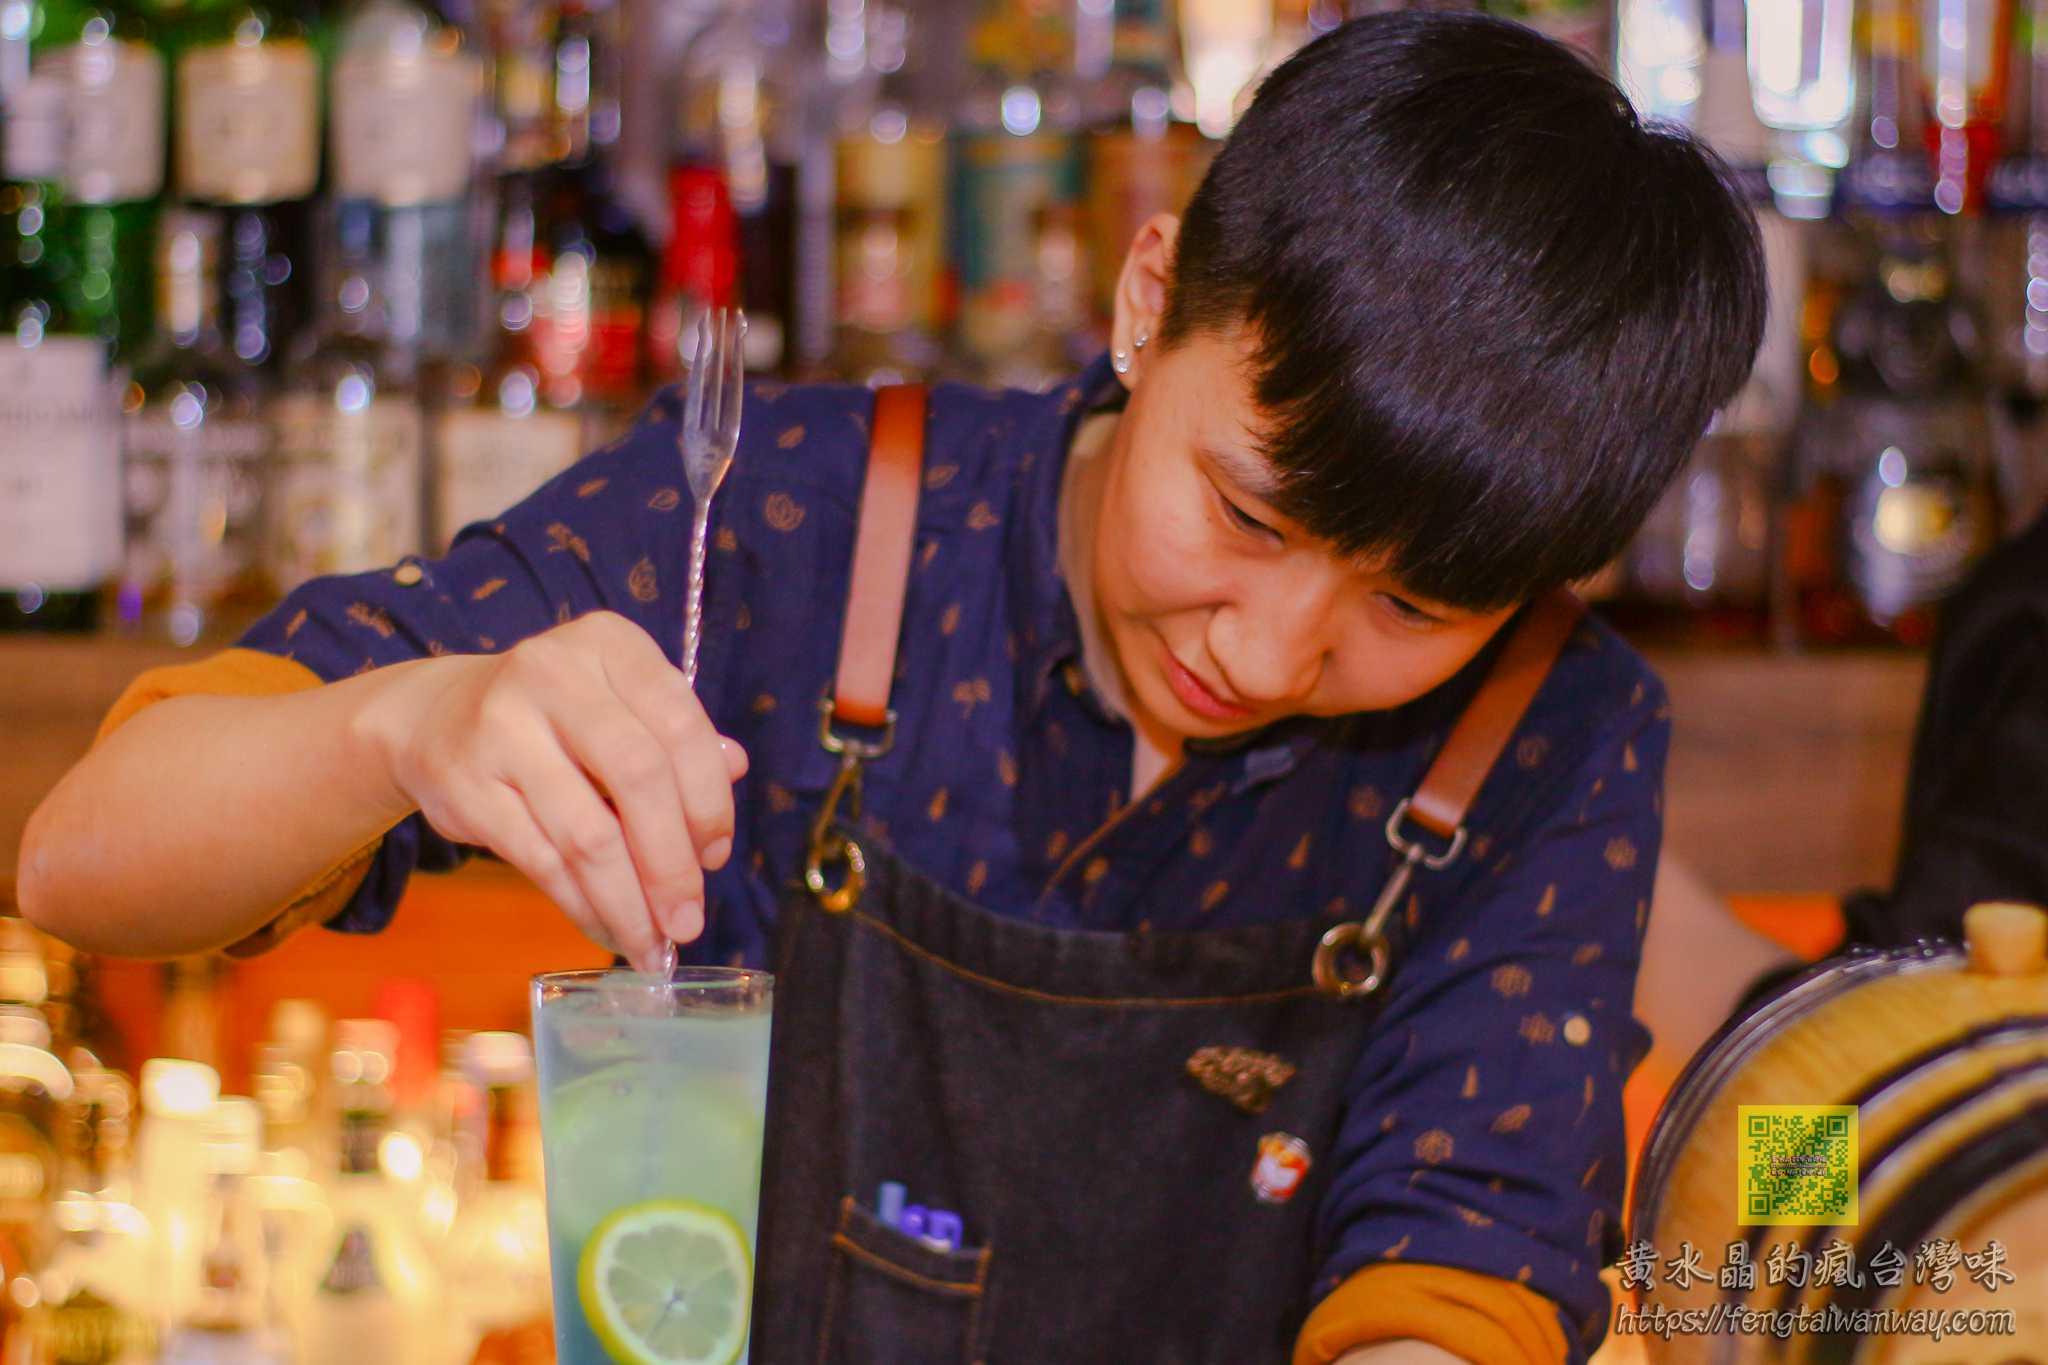 Mix Bistro餐酒館【桃園酒吧】 網美IG熱門打卡客製化調酒,職人調酒師的夏日微醺專業TIKI調酒 @黃水晶的瘋台灣味